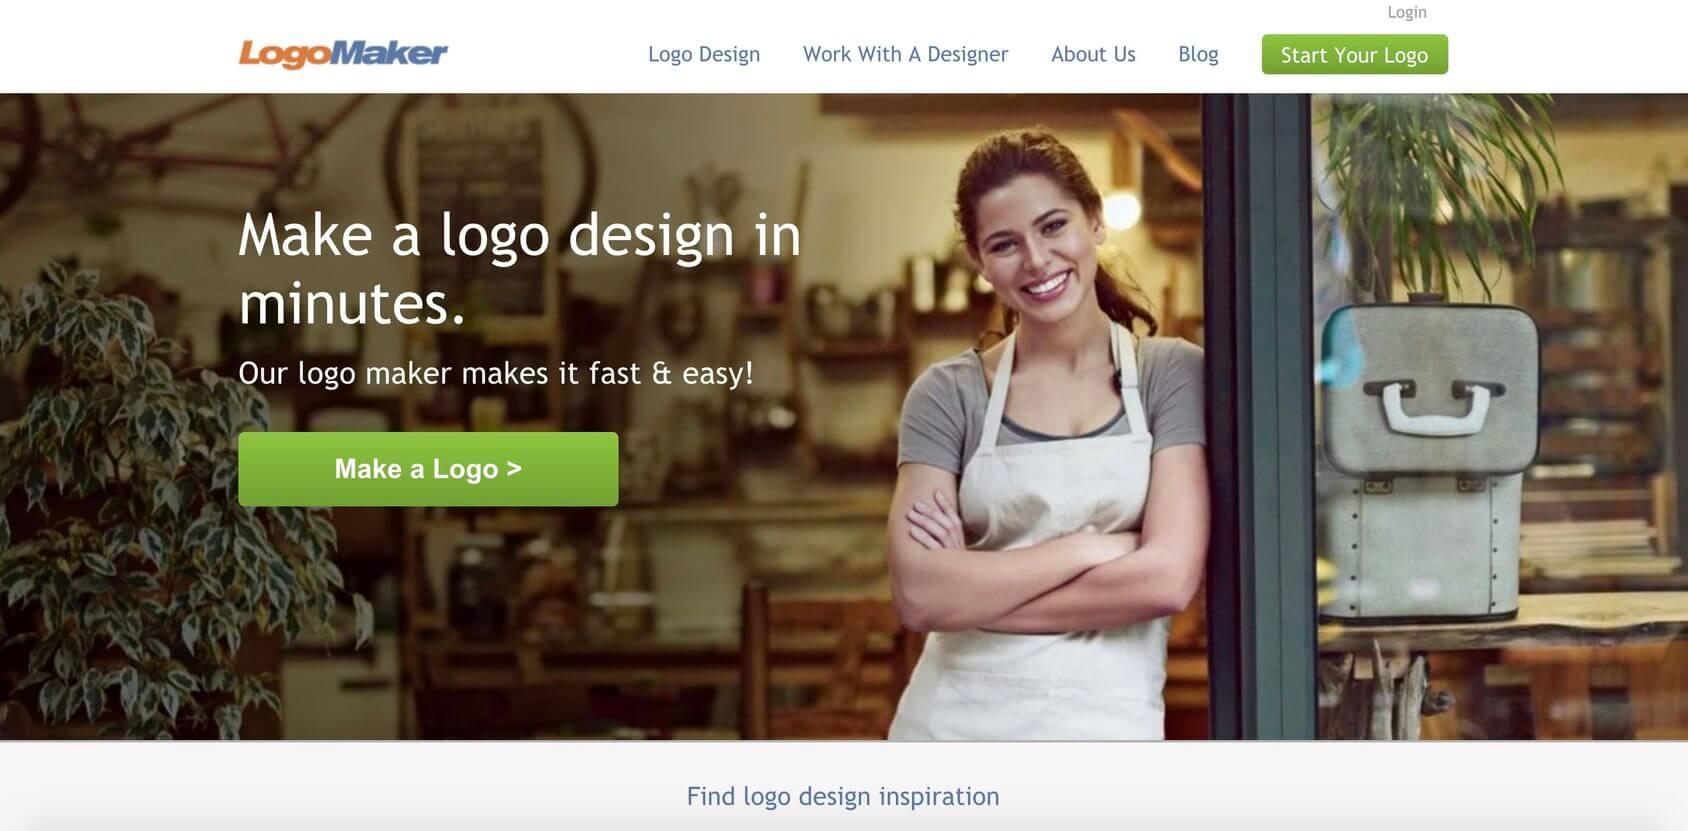 LogoMaker homepage